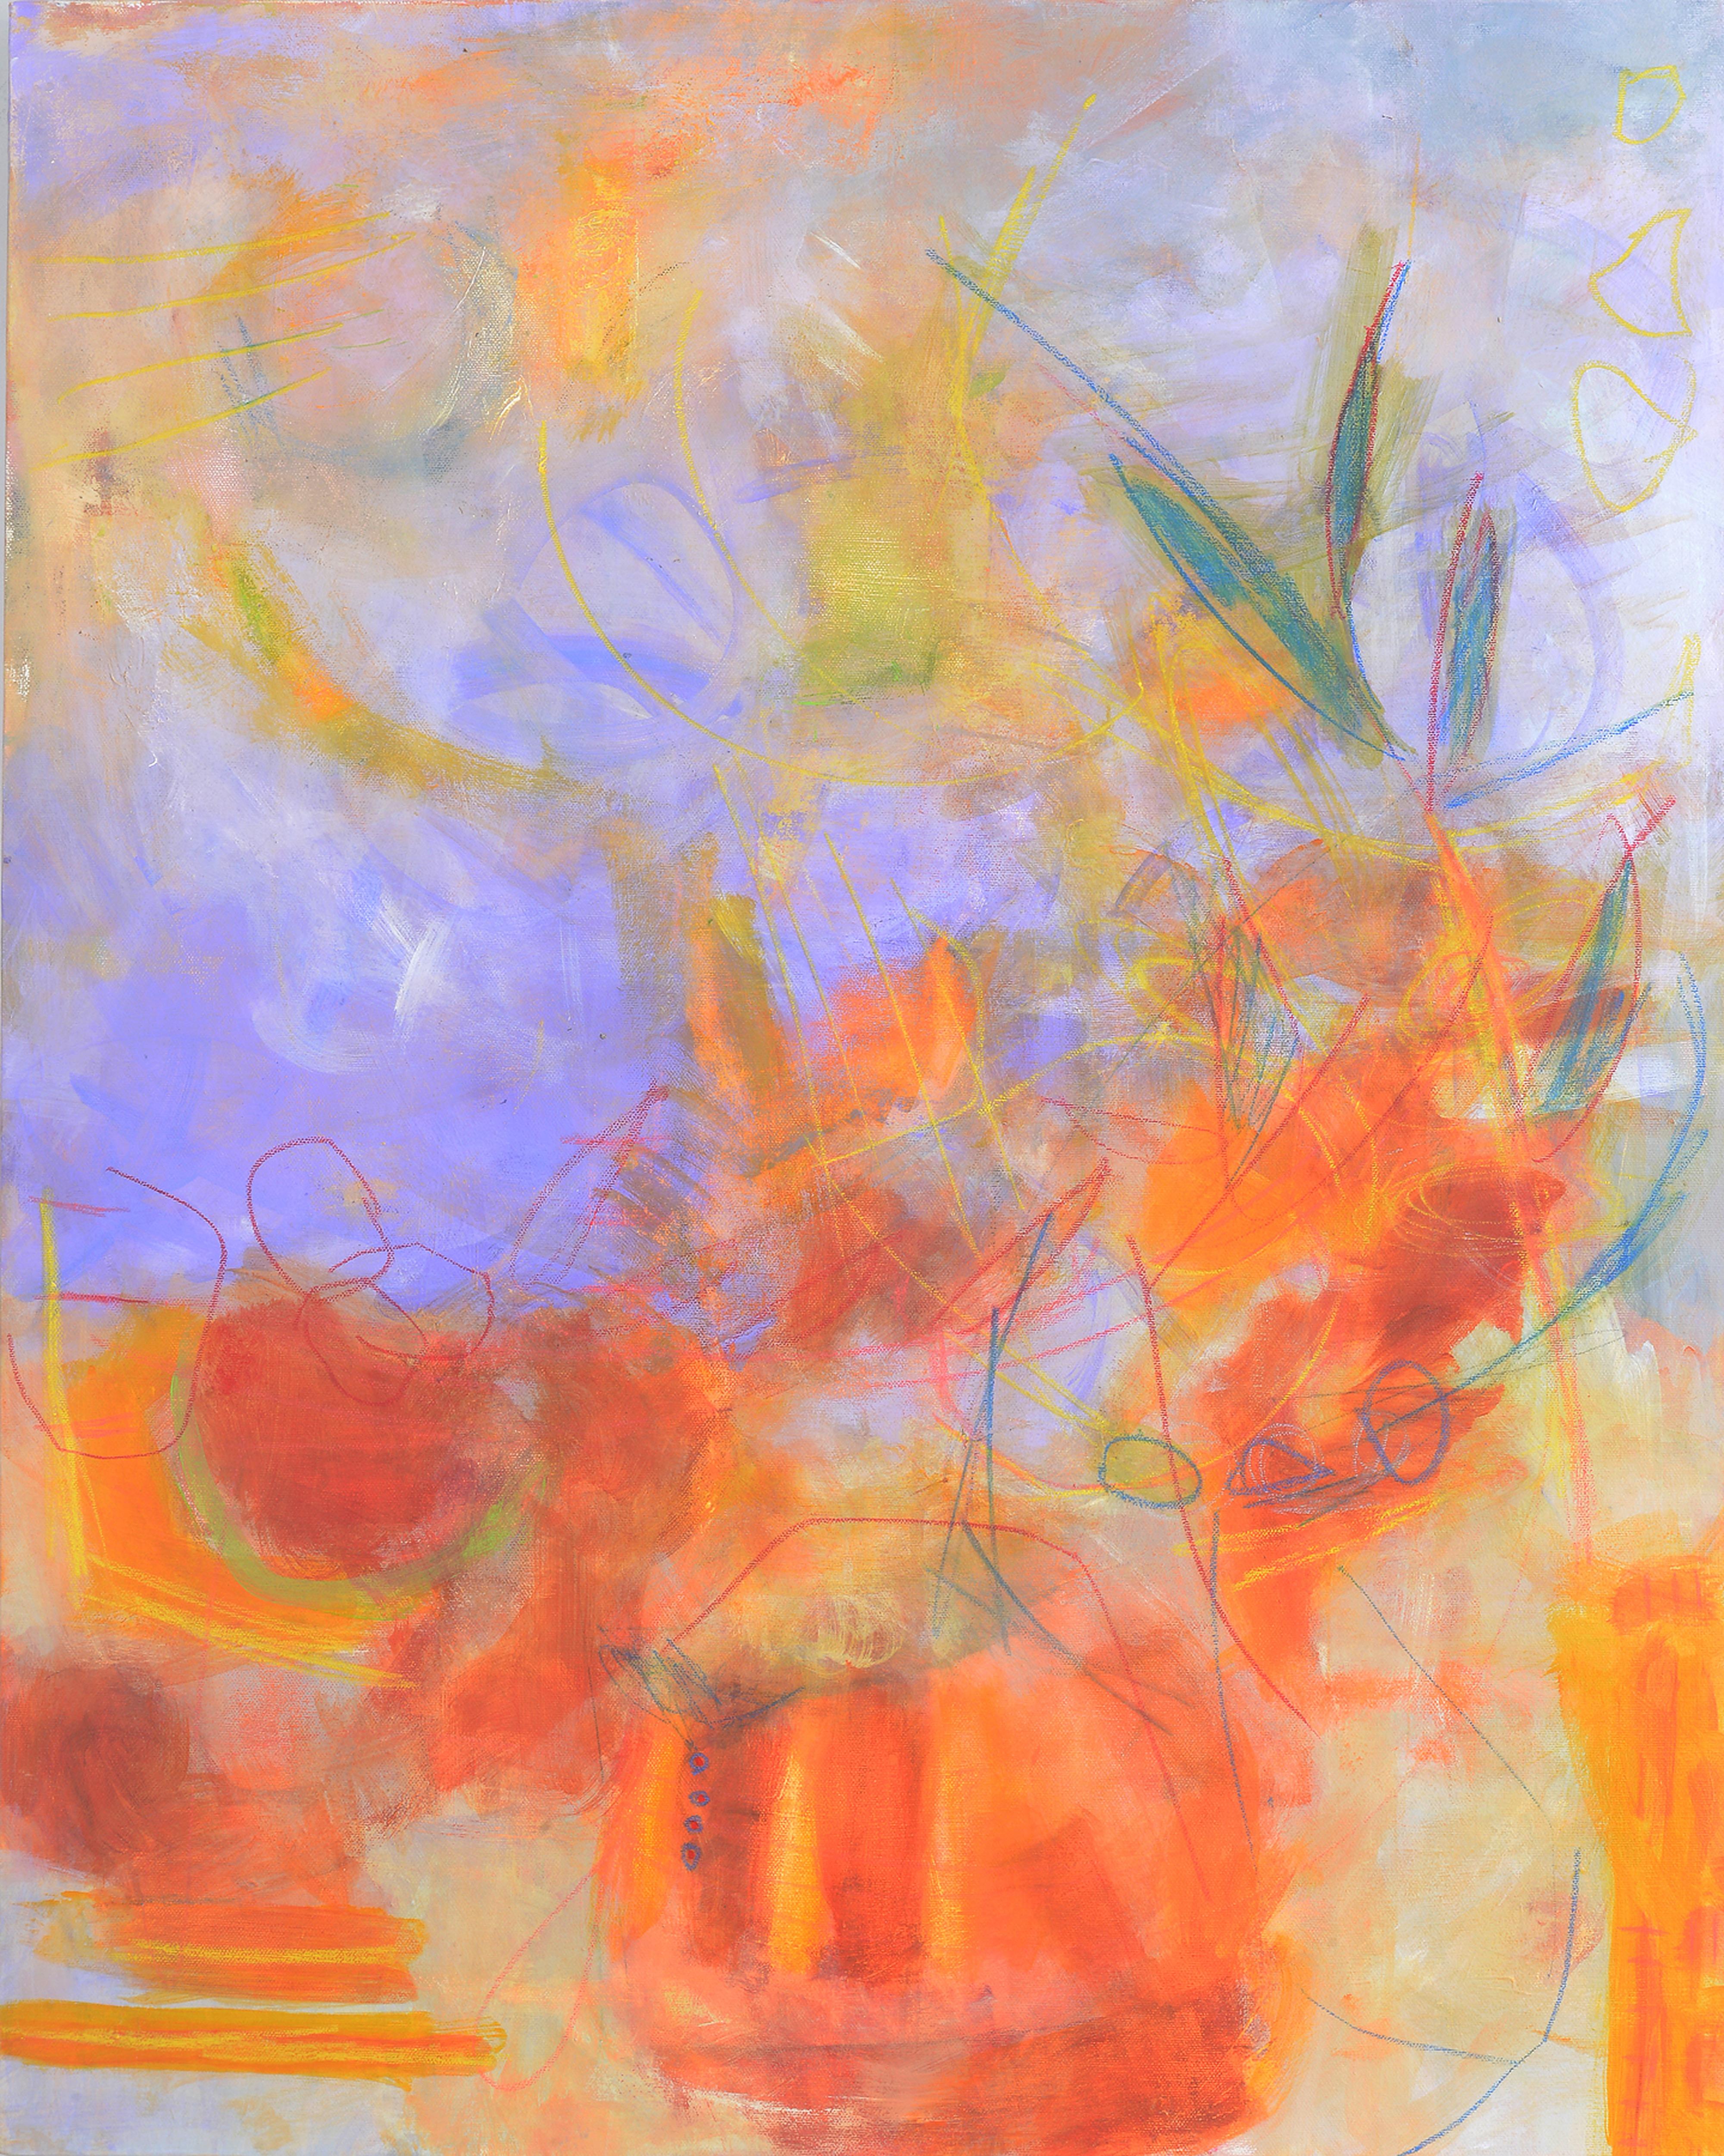 Into the Mystic by Marla Sullivan | ArtworkNetwork.com